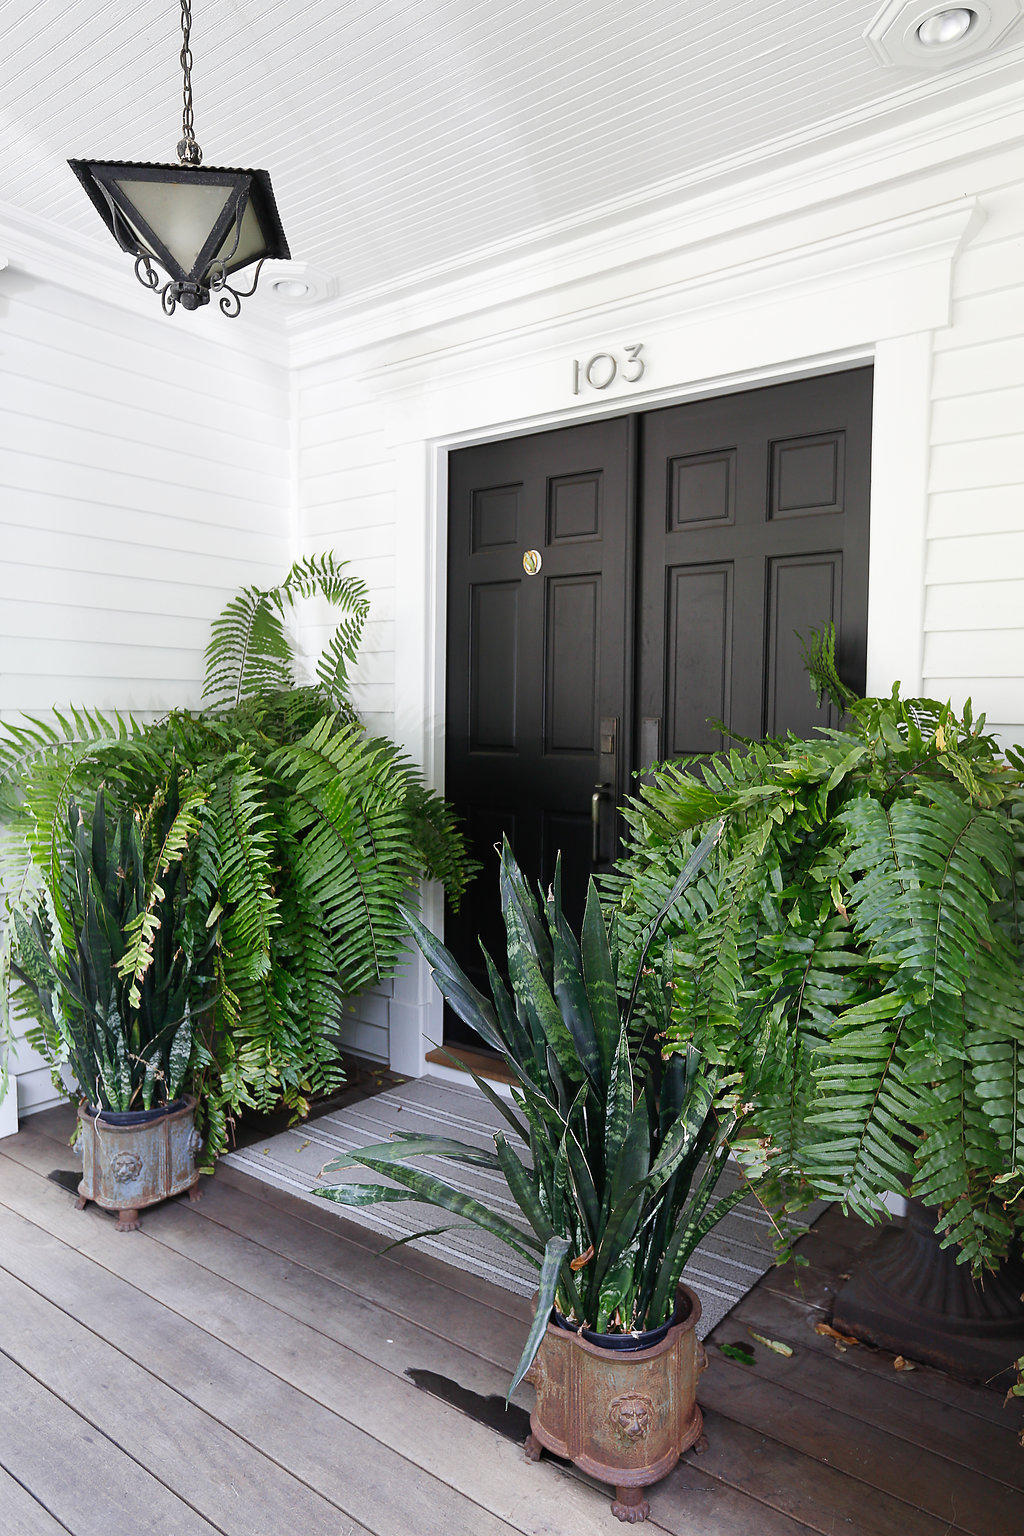 Old Village Homes For Sale - 103 Carr, Mount Pleasant, SC - 23